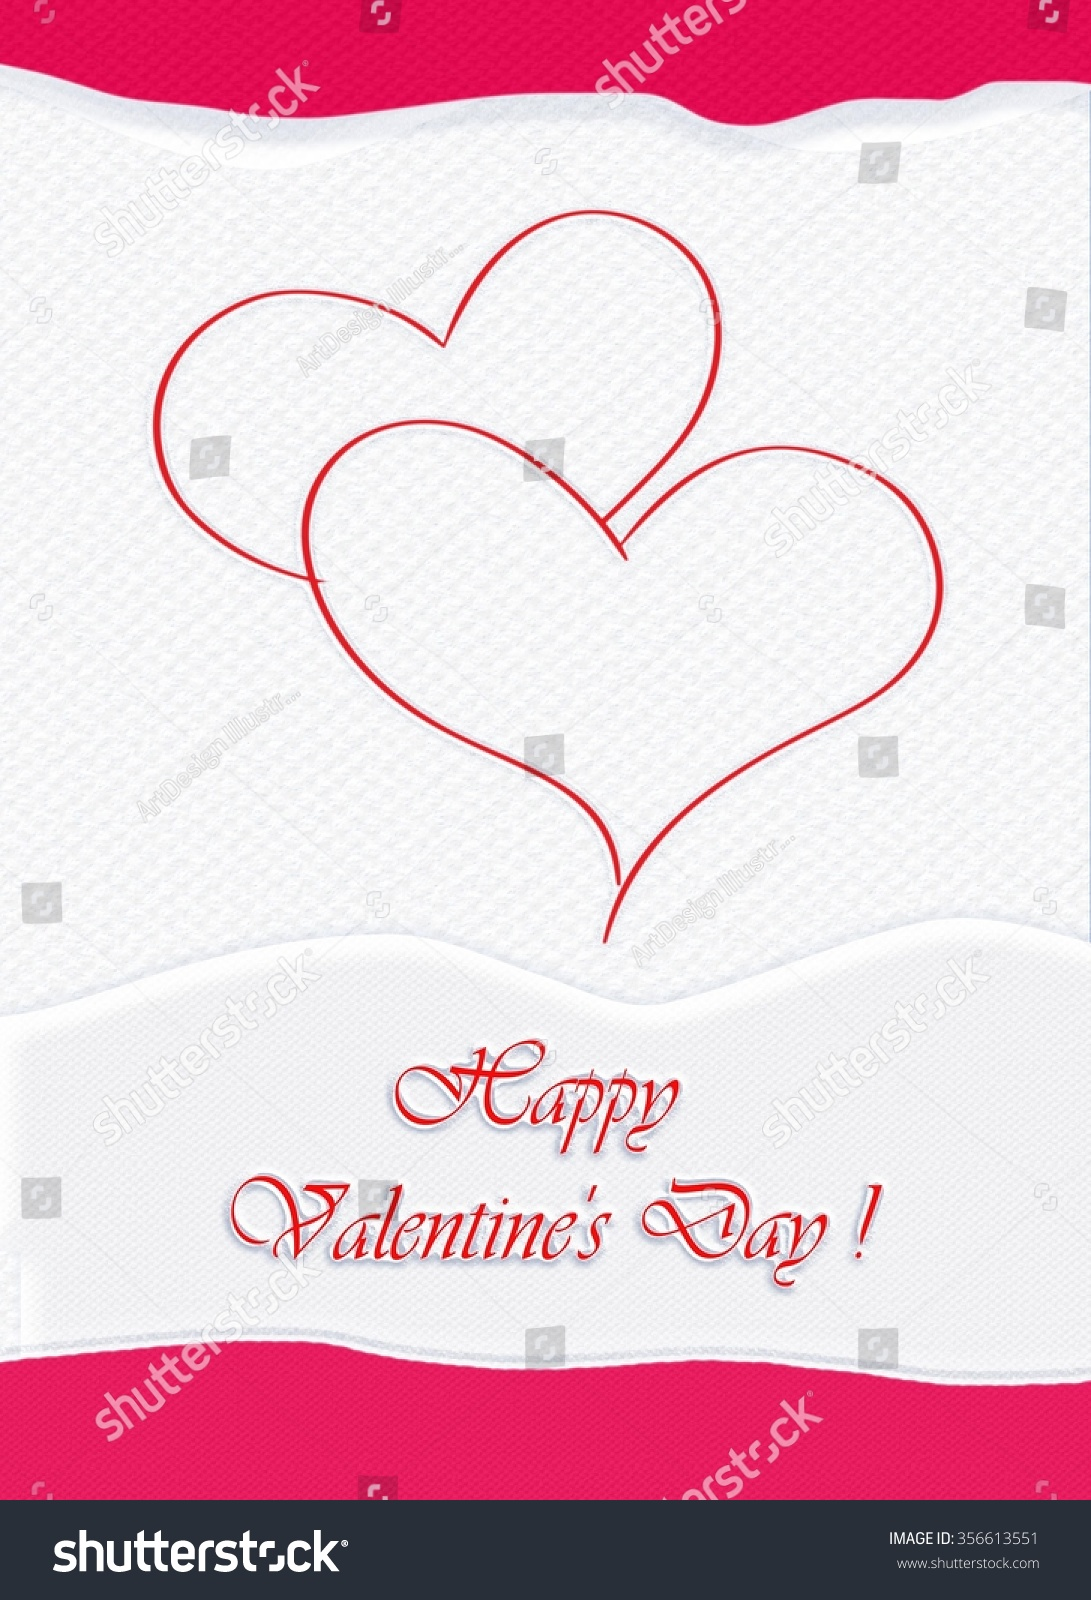 Valentine Day Greeting Cards Valentine Card Stock Illustration